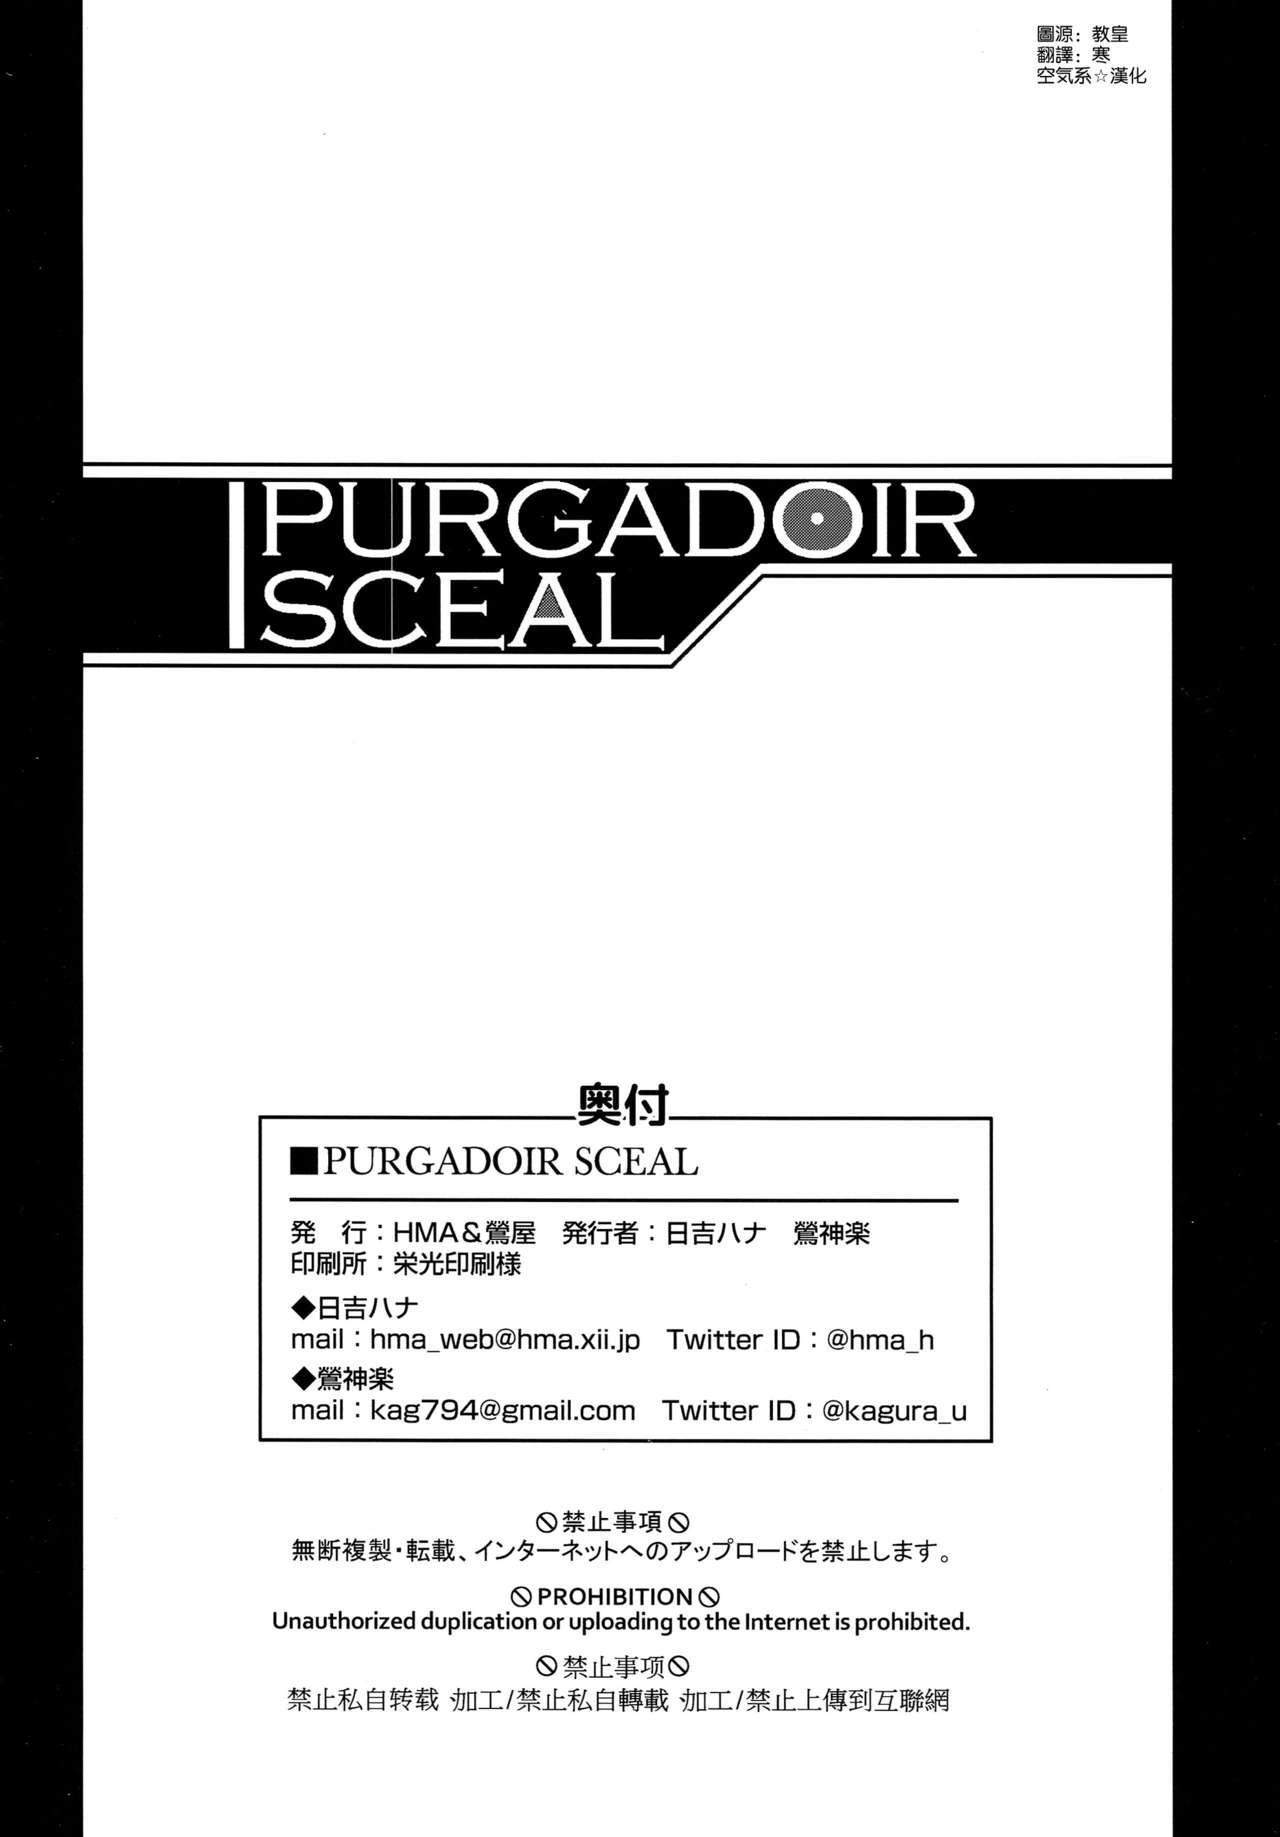 PURGADOIR SCEAL 25